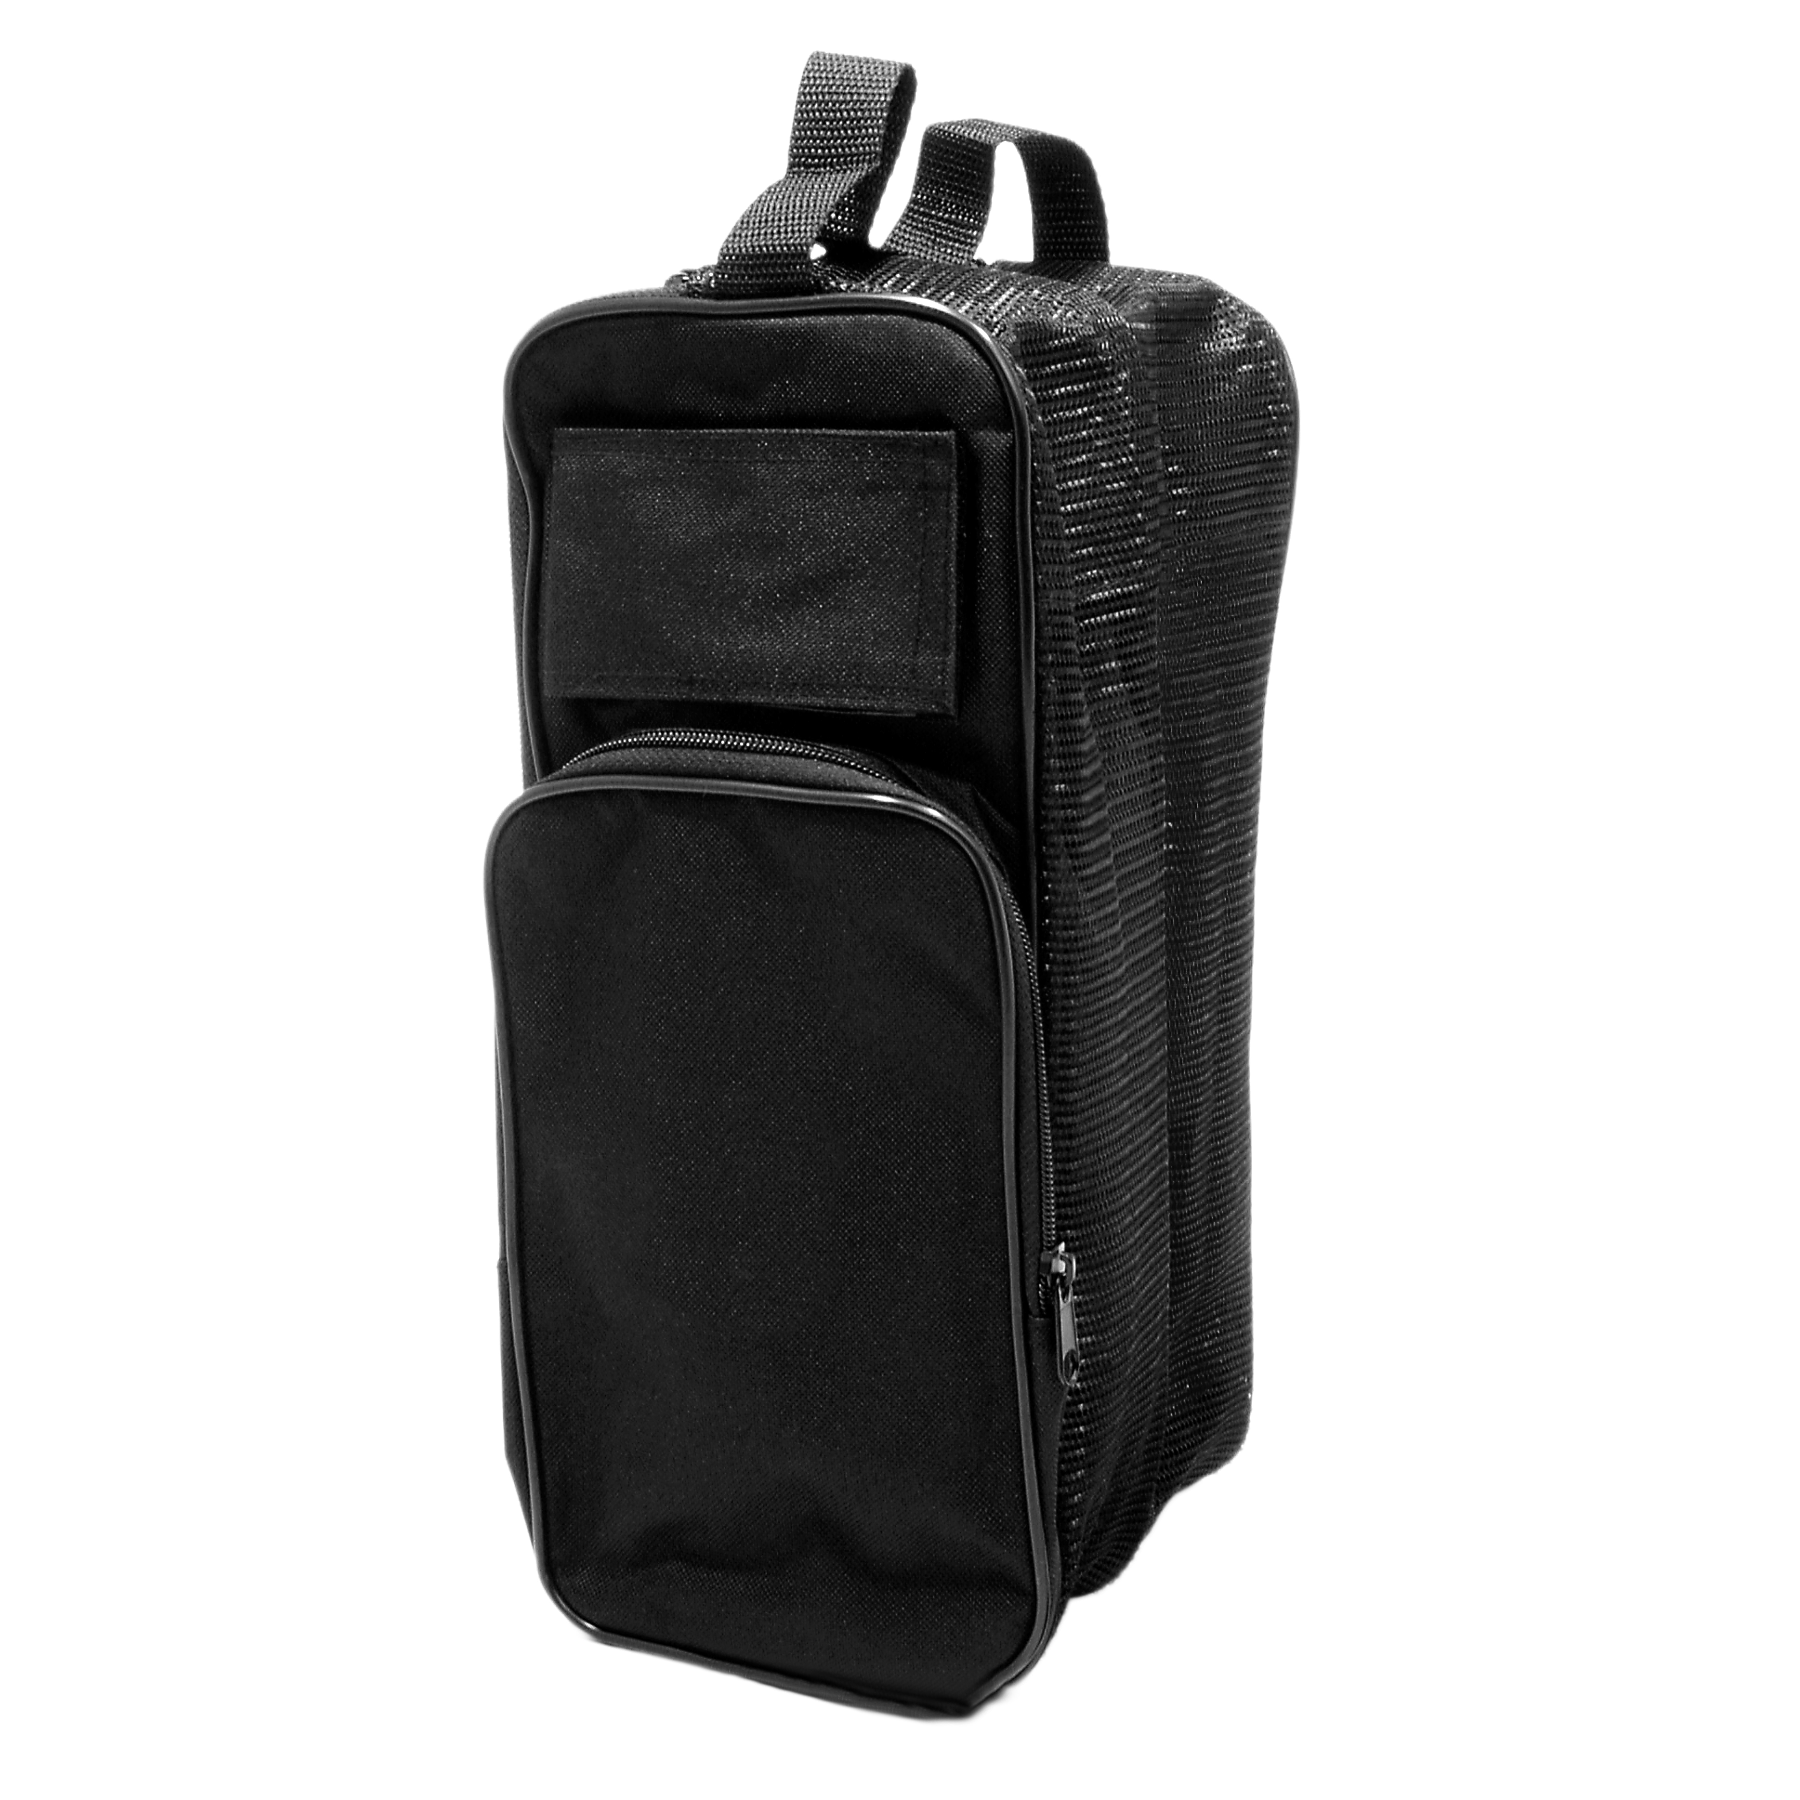 ProActive Sports Deluxe Travel Shoe Bag